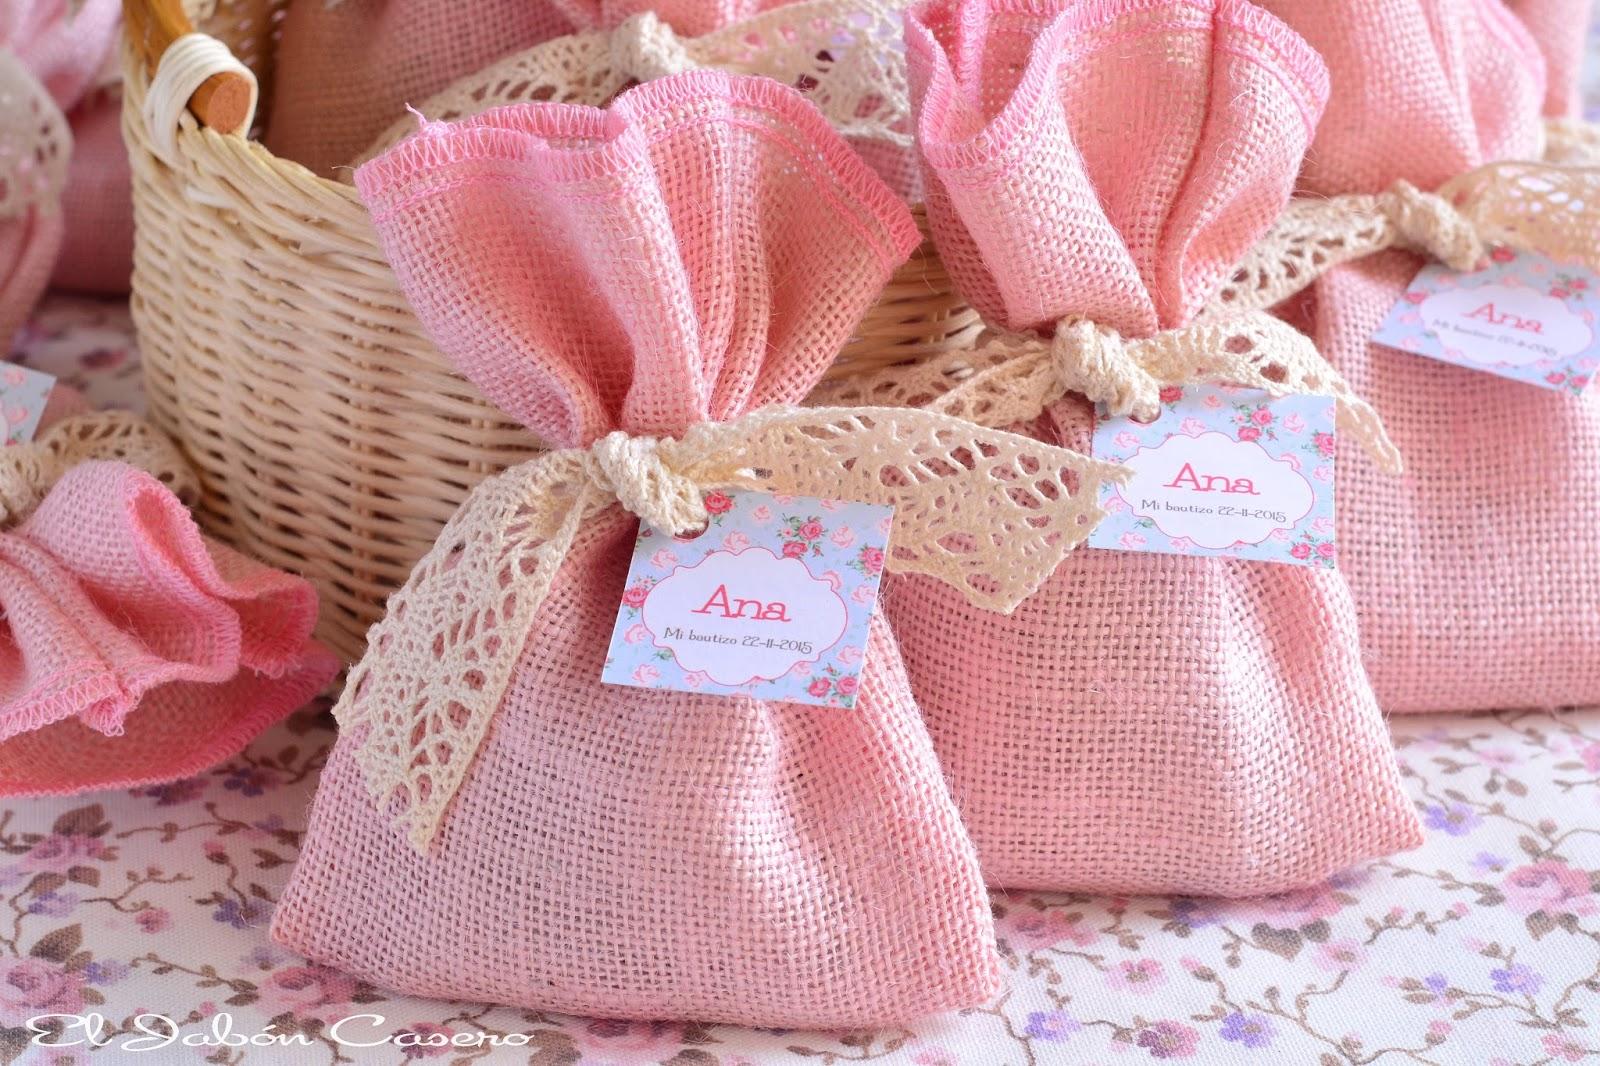 El jab n casero detalles de bautizo en rosa bolsitas for Detalles de decoracion